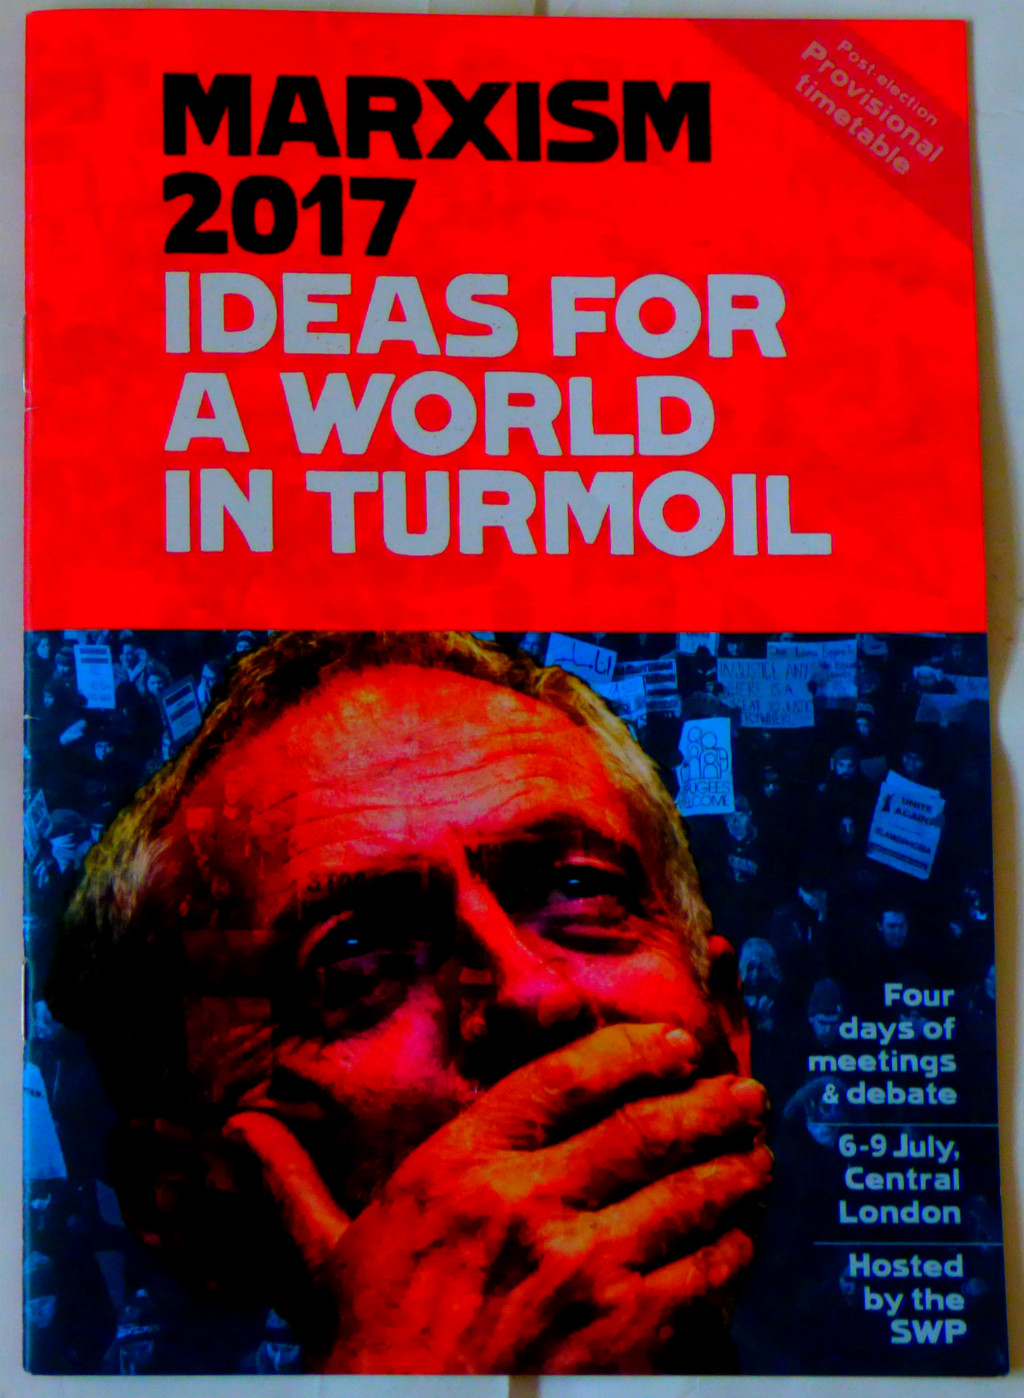 Marxism 2017